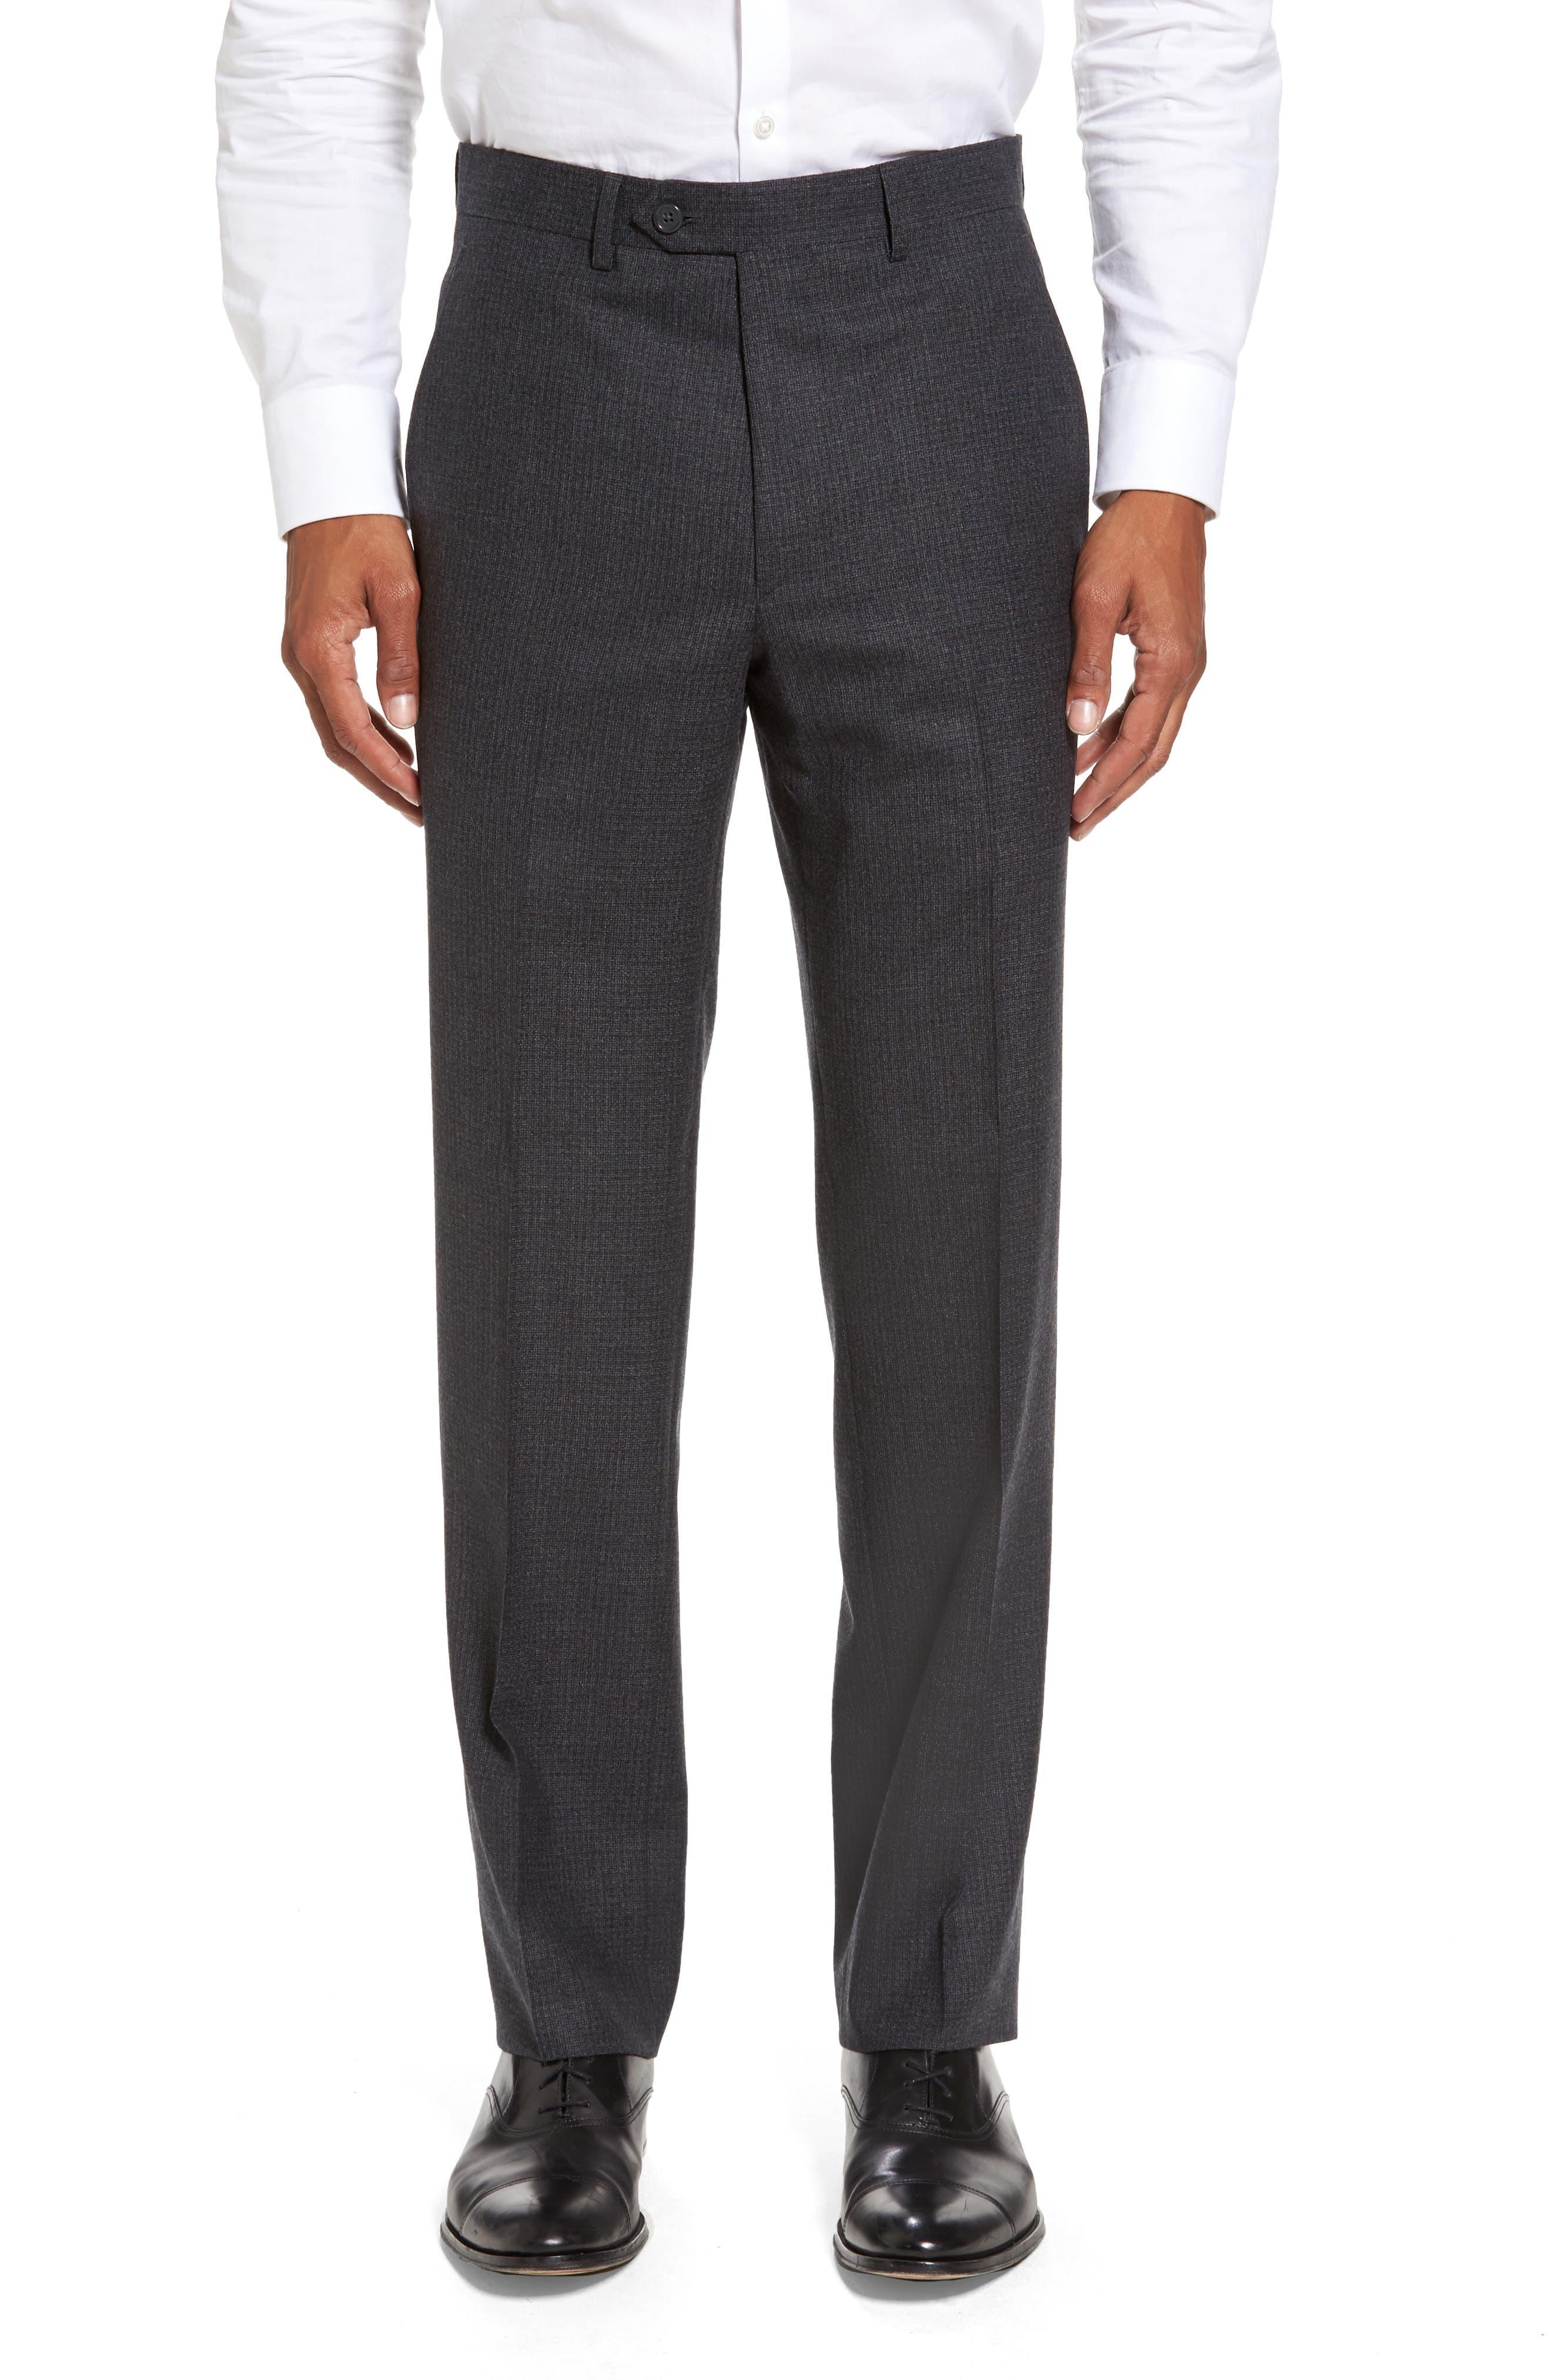 Romero Regular Fit Flat Front Trousers,                             Main thumbnail 1, color,                             010